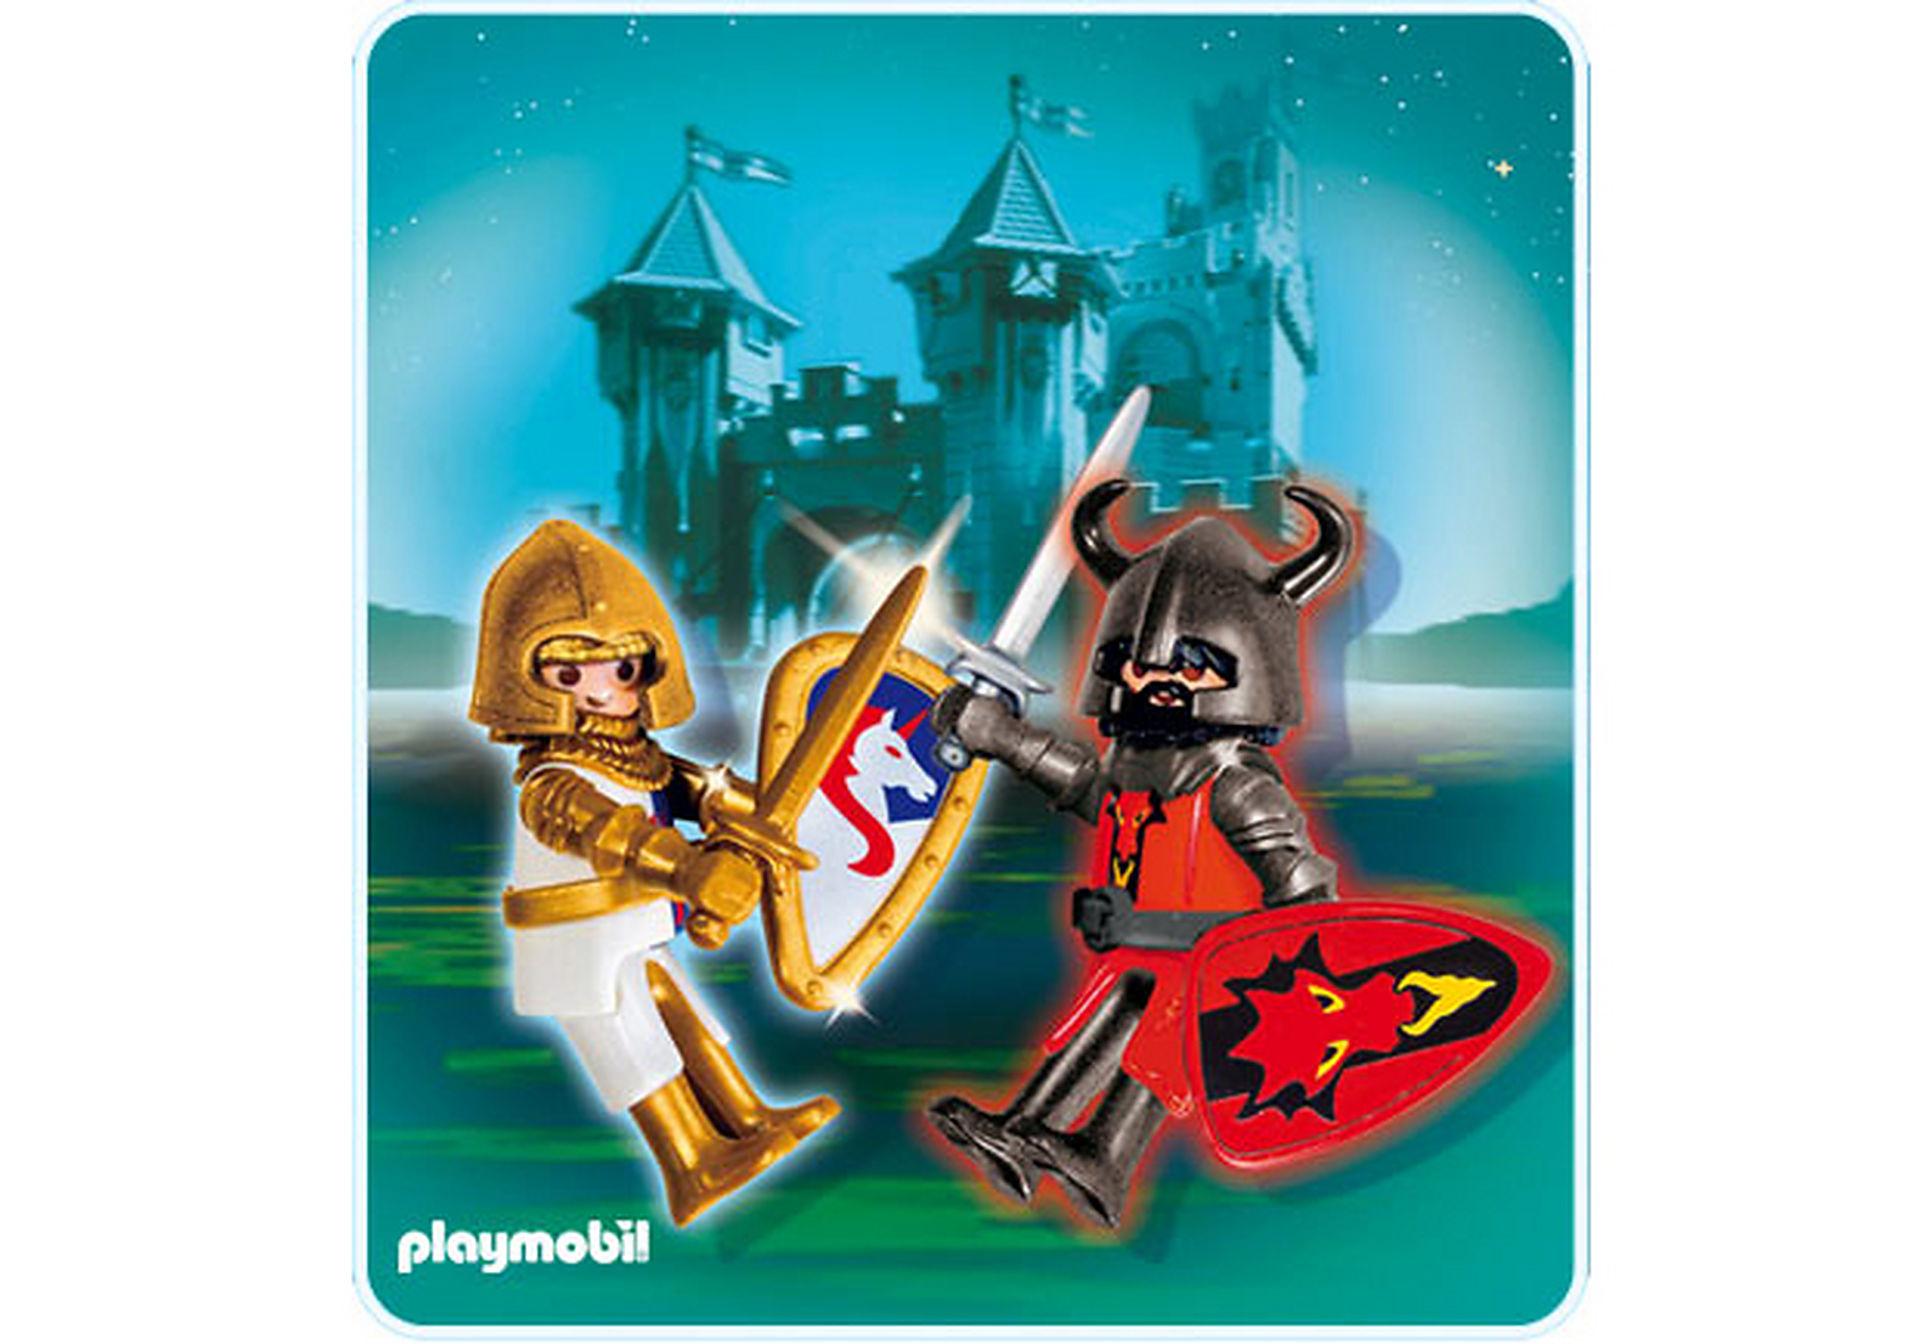 http://media.playmobil.com/i/playmobil/5815-A_product_detail/Einhorn- und Drachenritter